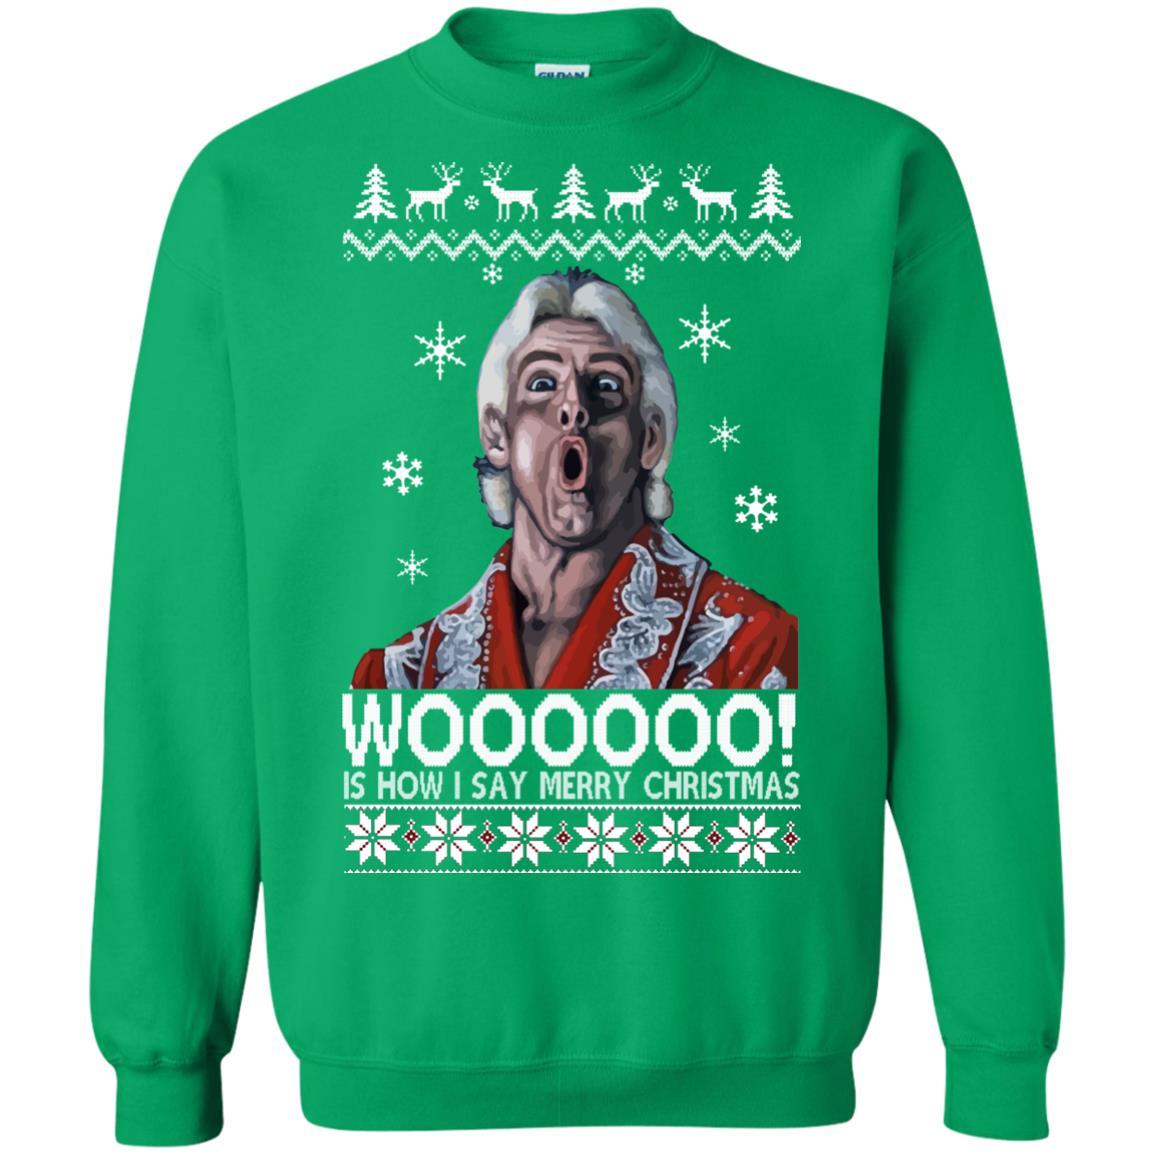 green ric flair woo christmas sweater ugly sweatshirt